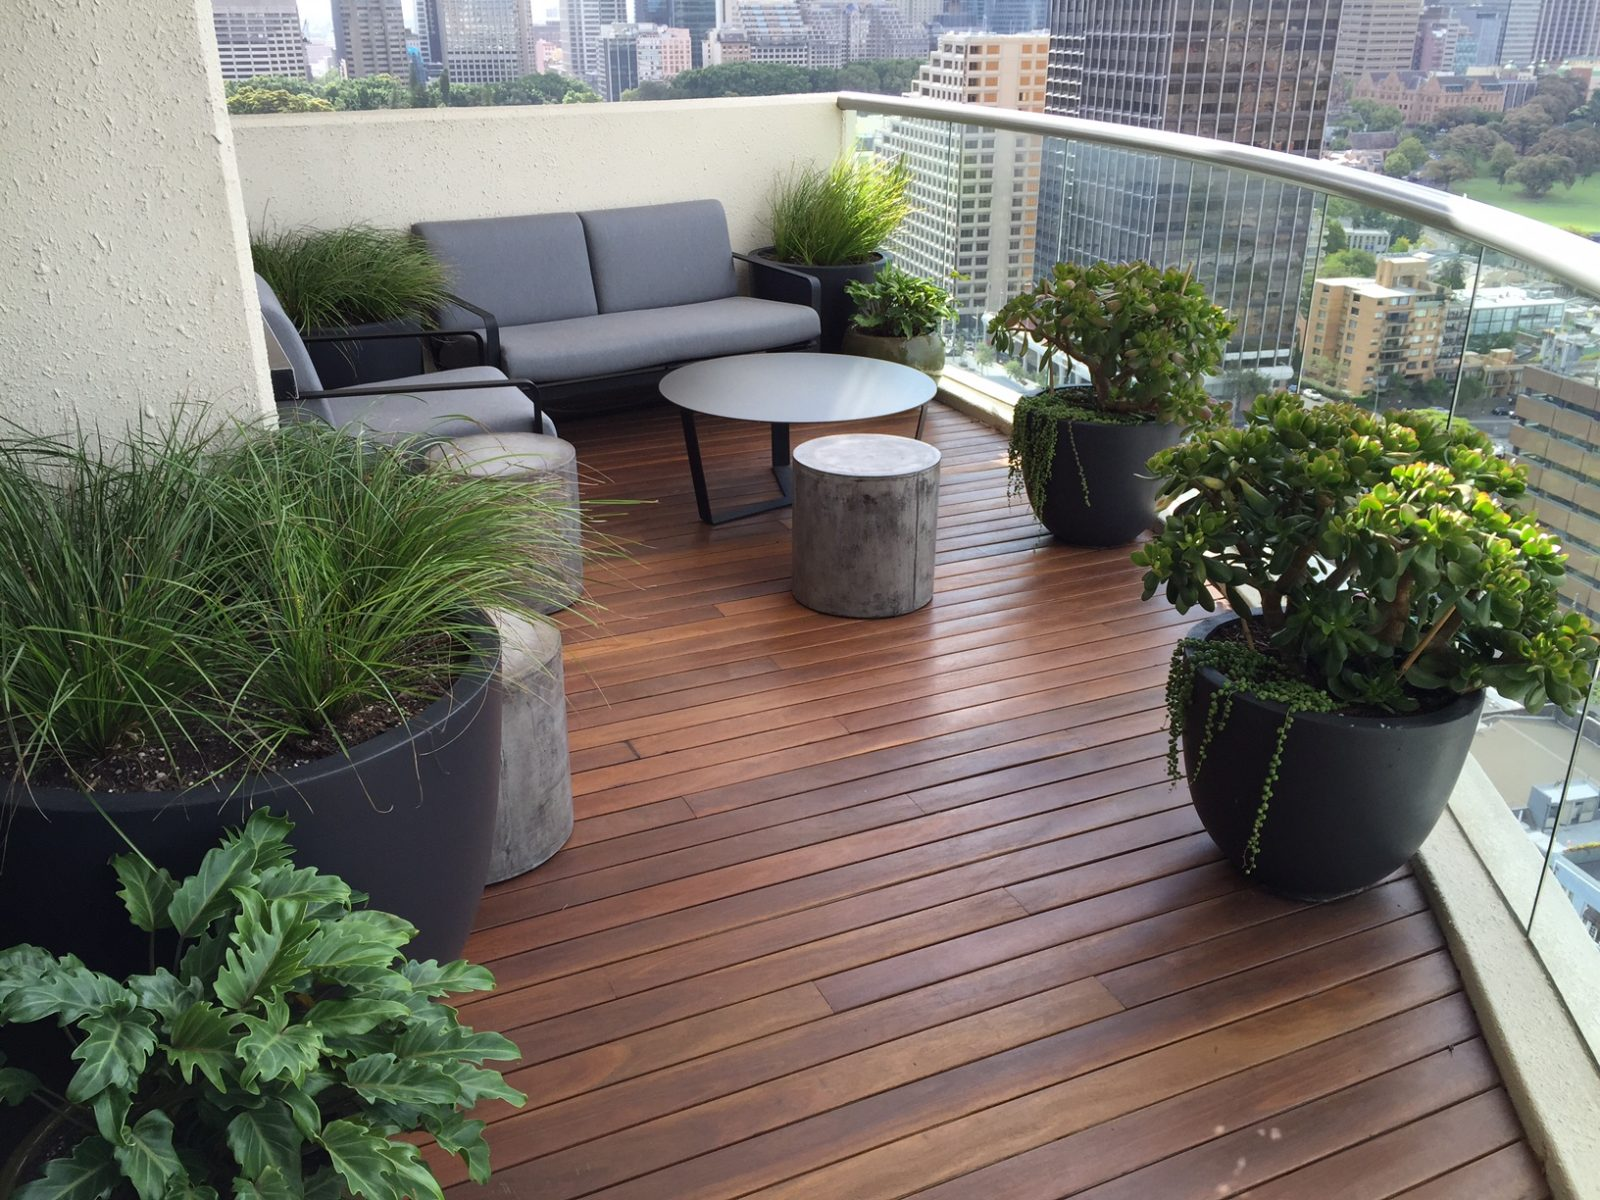 Urban Oasis Balcony Gardens That Prove Green Is Always In